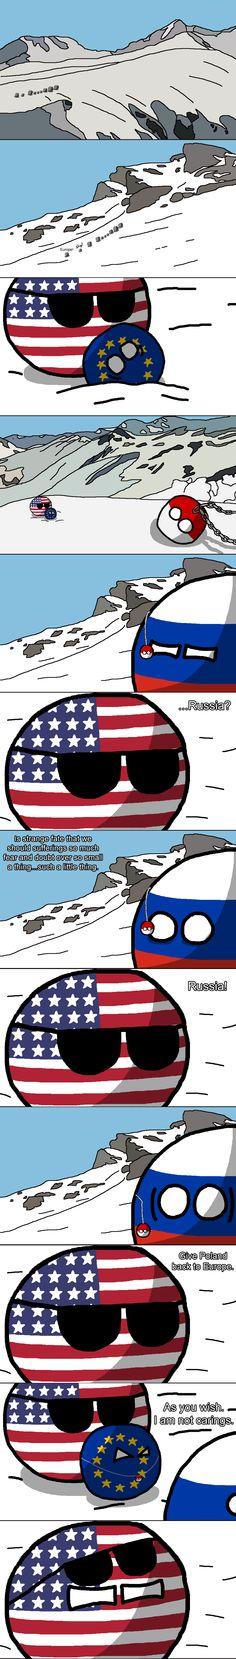 "Lord of the rings  part I ""The Mountain Pass"" ( USA, Russia, Europe, Poland ) by Baron koleye of kolaje #polandball #countryball"